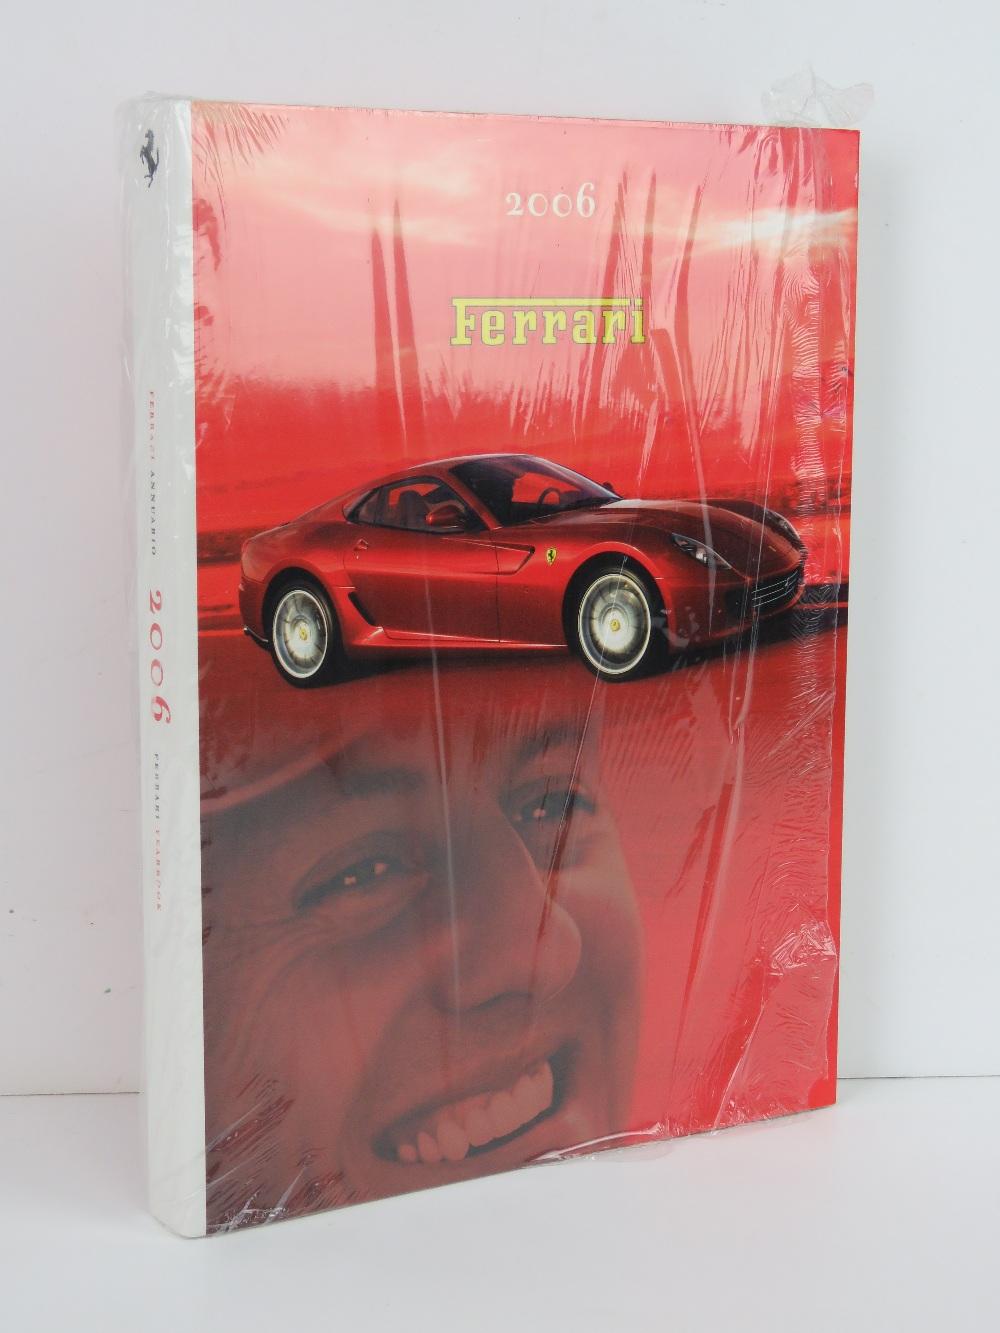 Ferrari Yearbook 2006. English / Italian edition. Softback book.